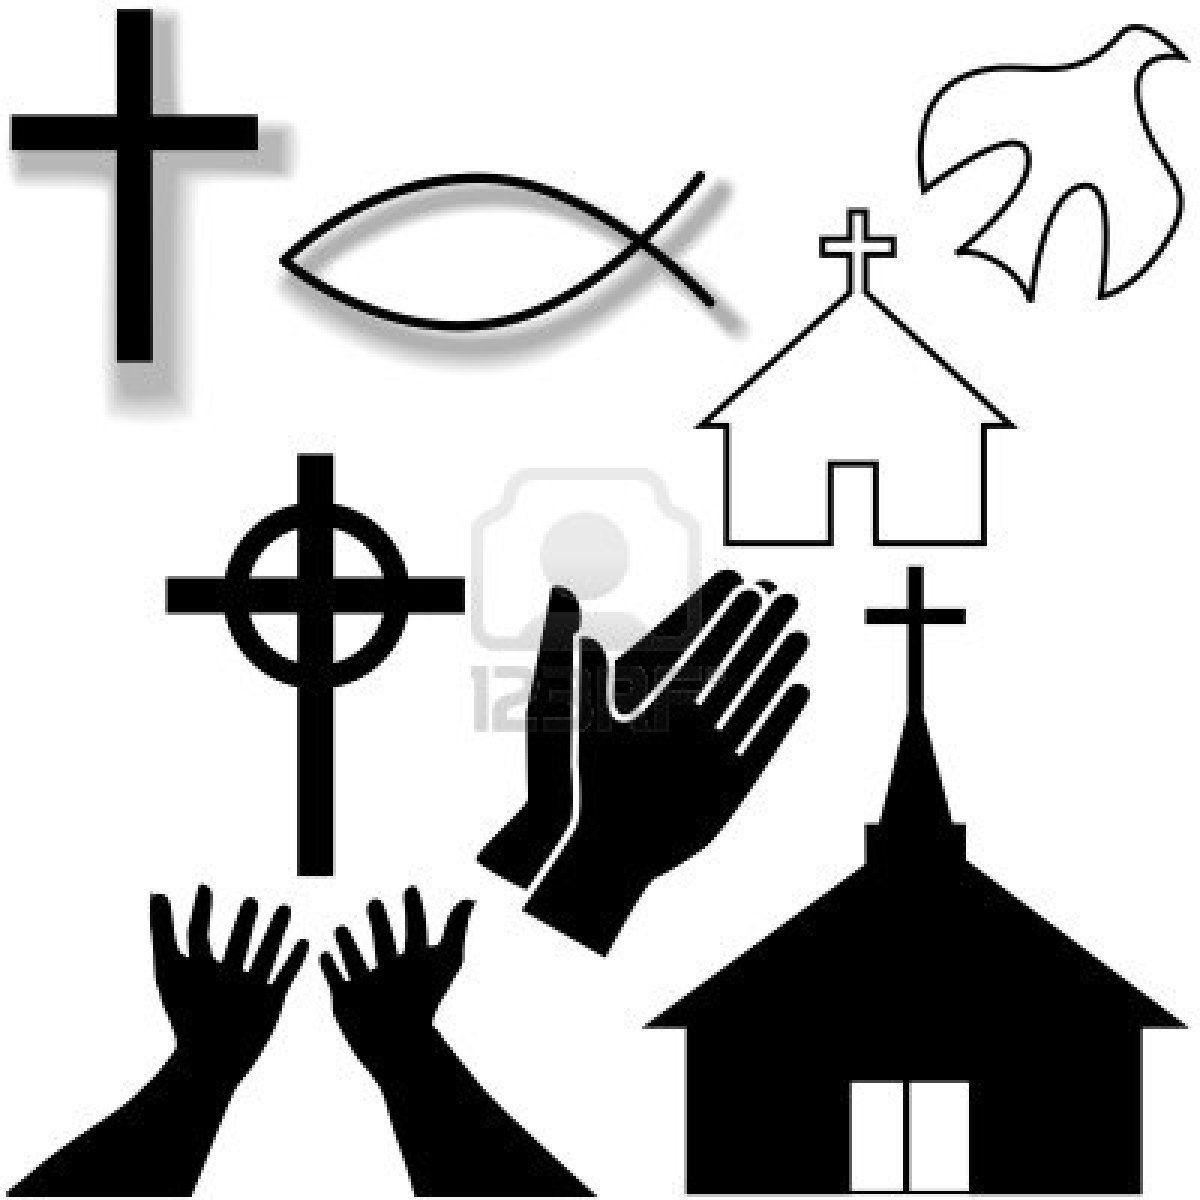 Churches Crosses Holy Spirit Dove Fish Symbol Hands Praying